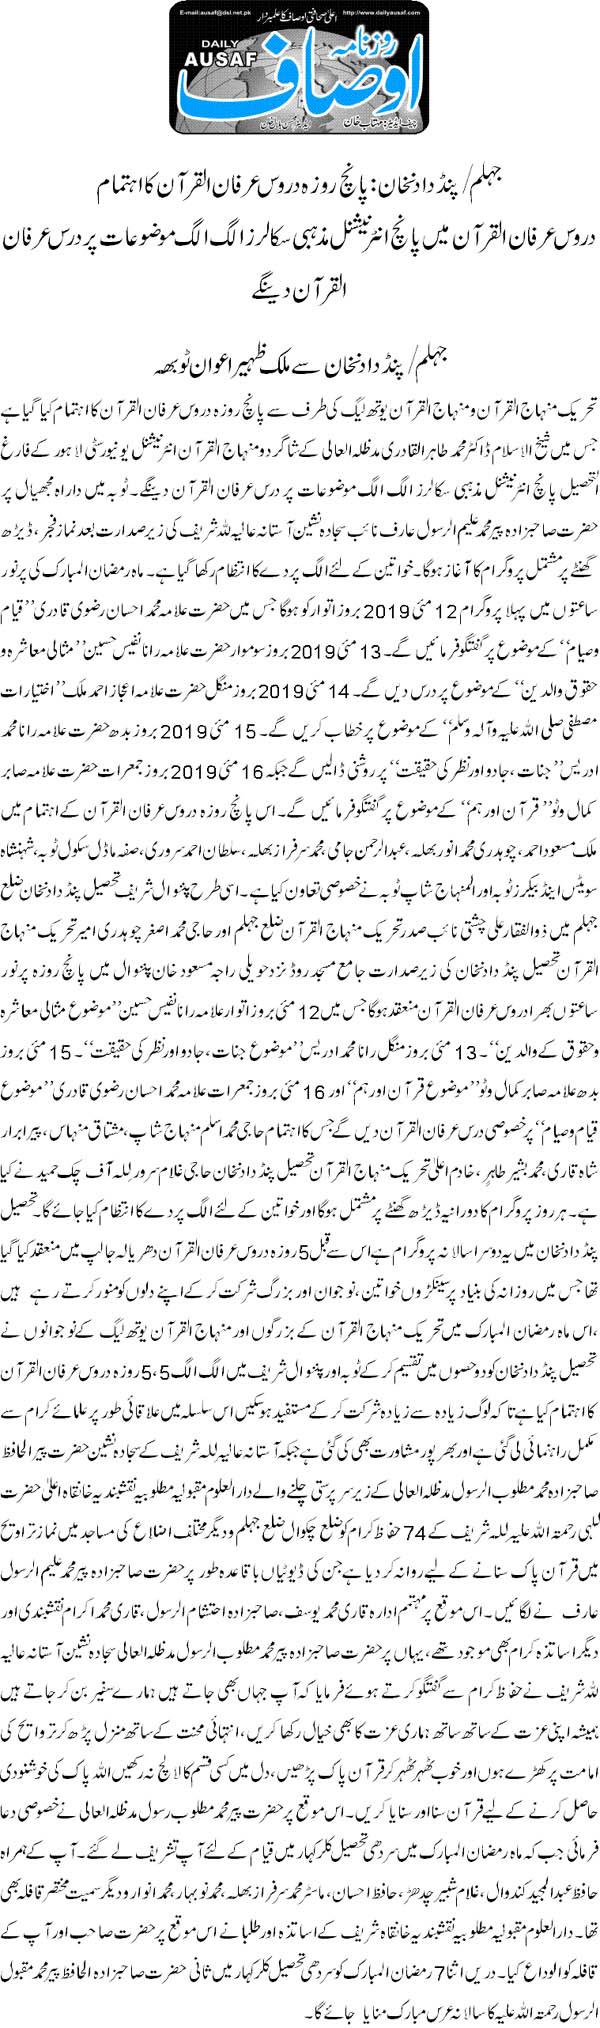 Pakistan Awami Tehreek  Print Media Coverage Daily Ausaf (Pinddadankhan)